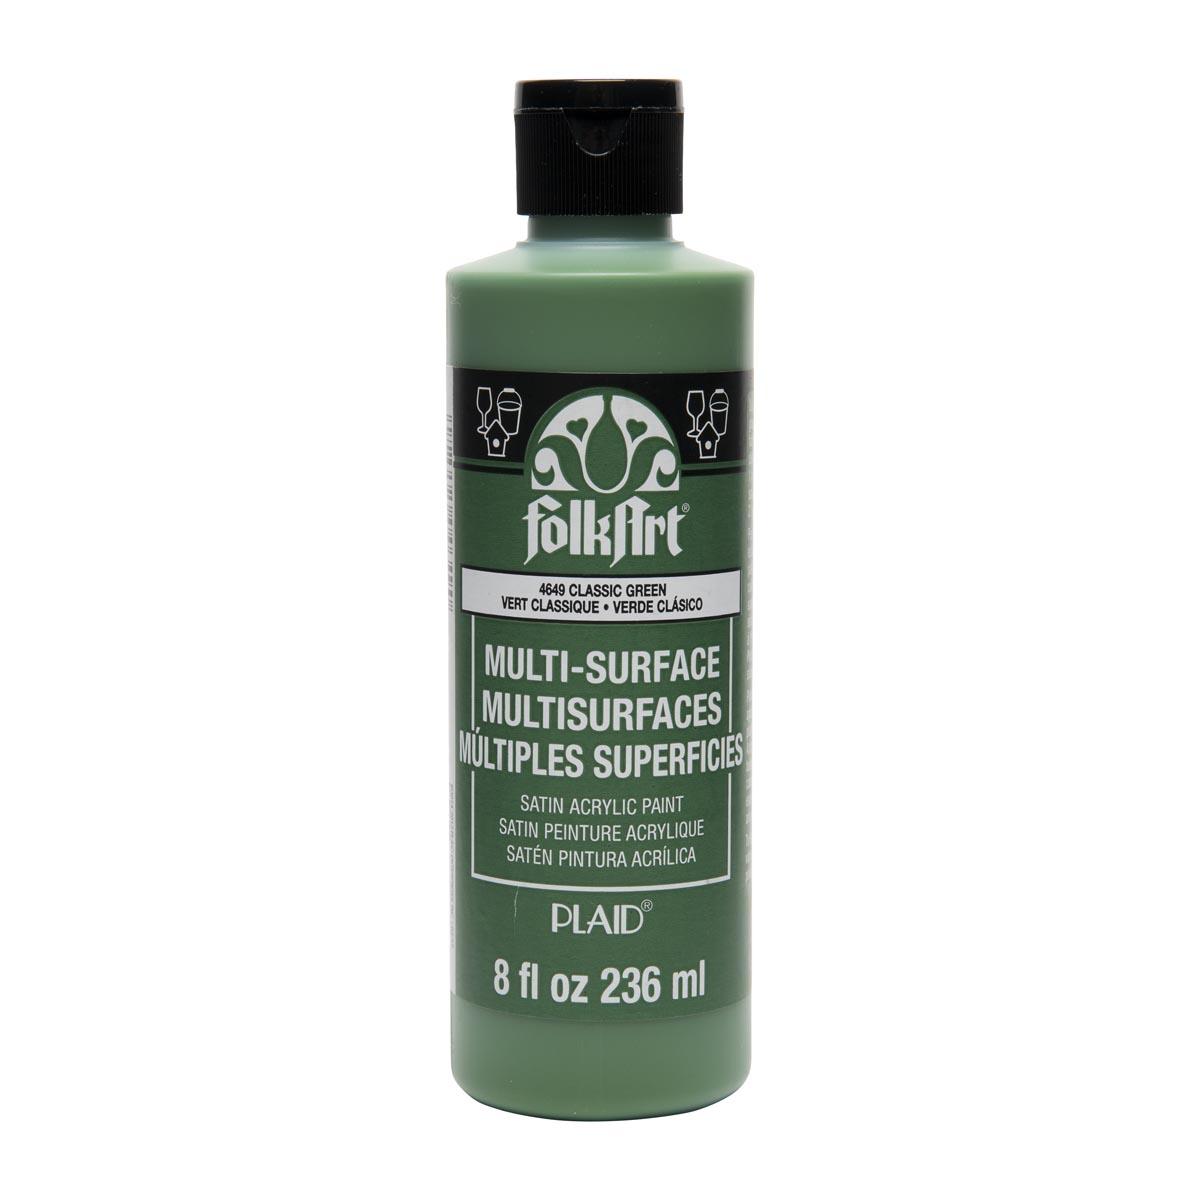 FolkArt ® Multi-Surface Satin Acrylic Paints - Classic Green, 8 oz.